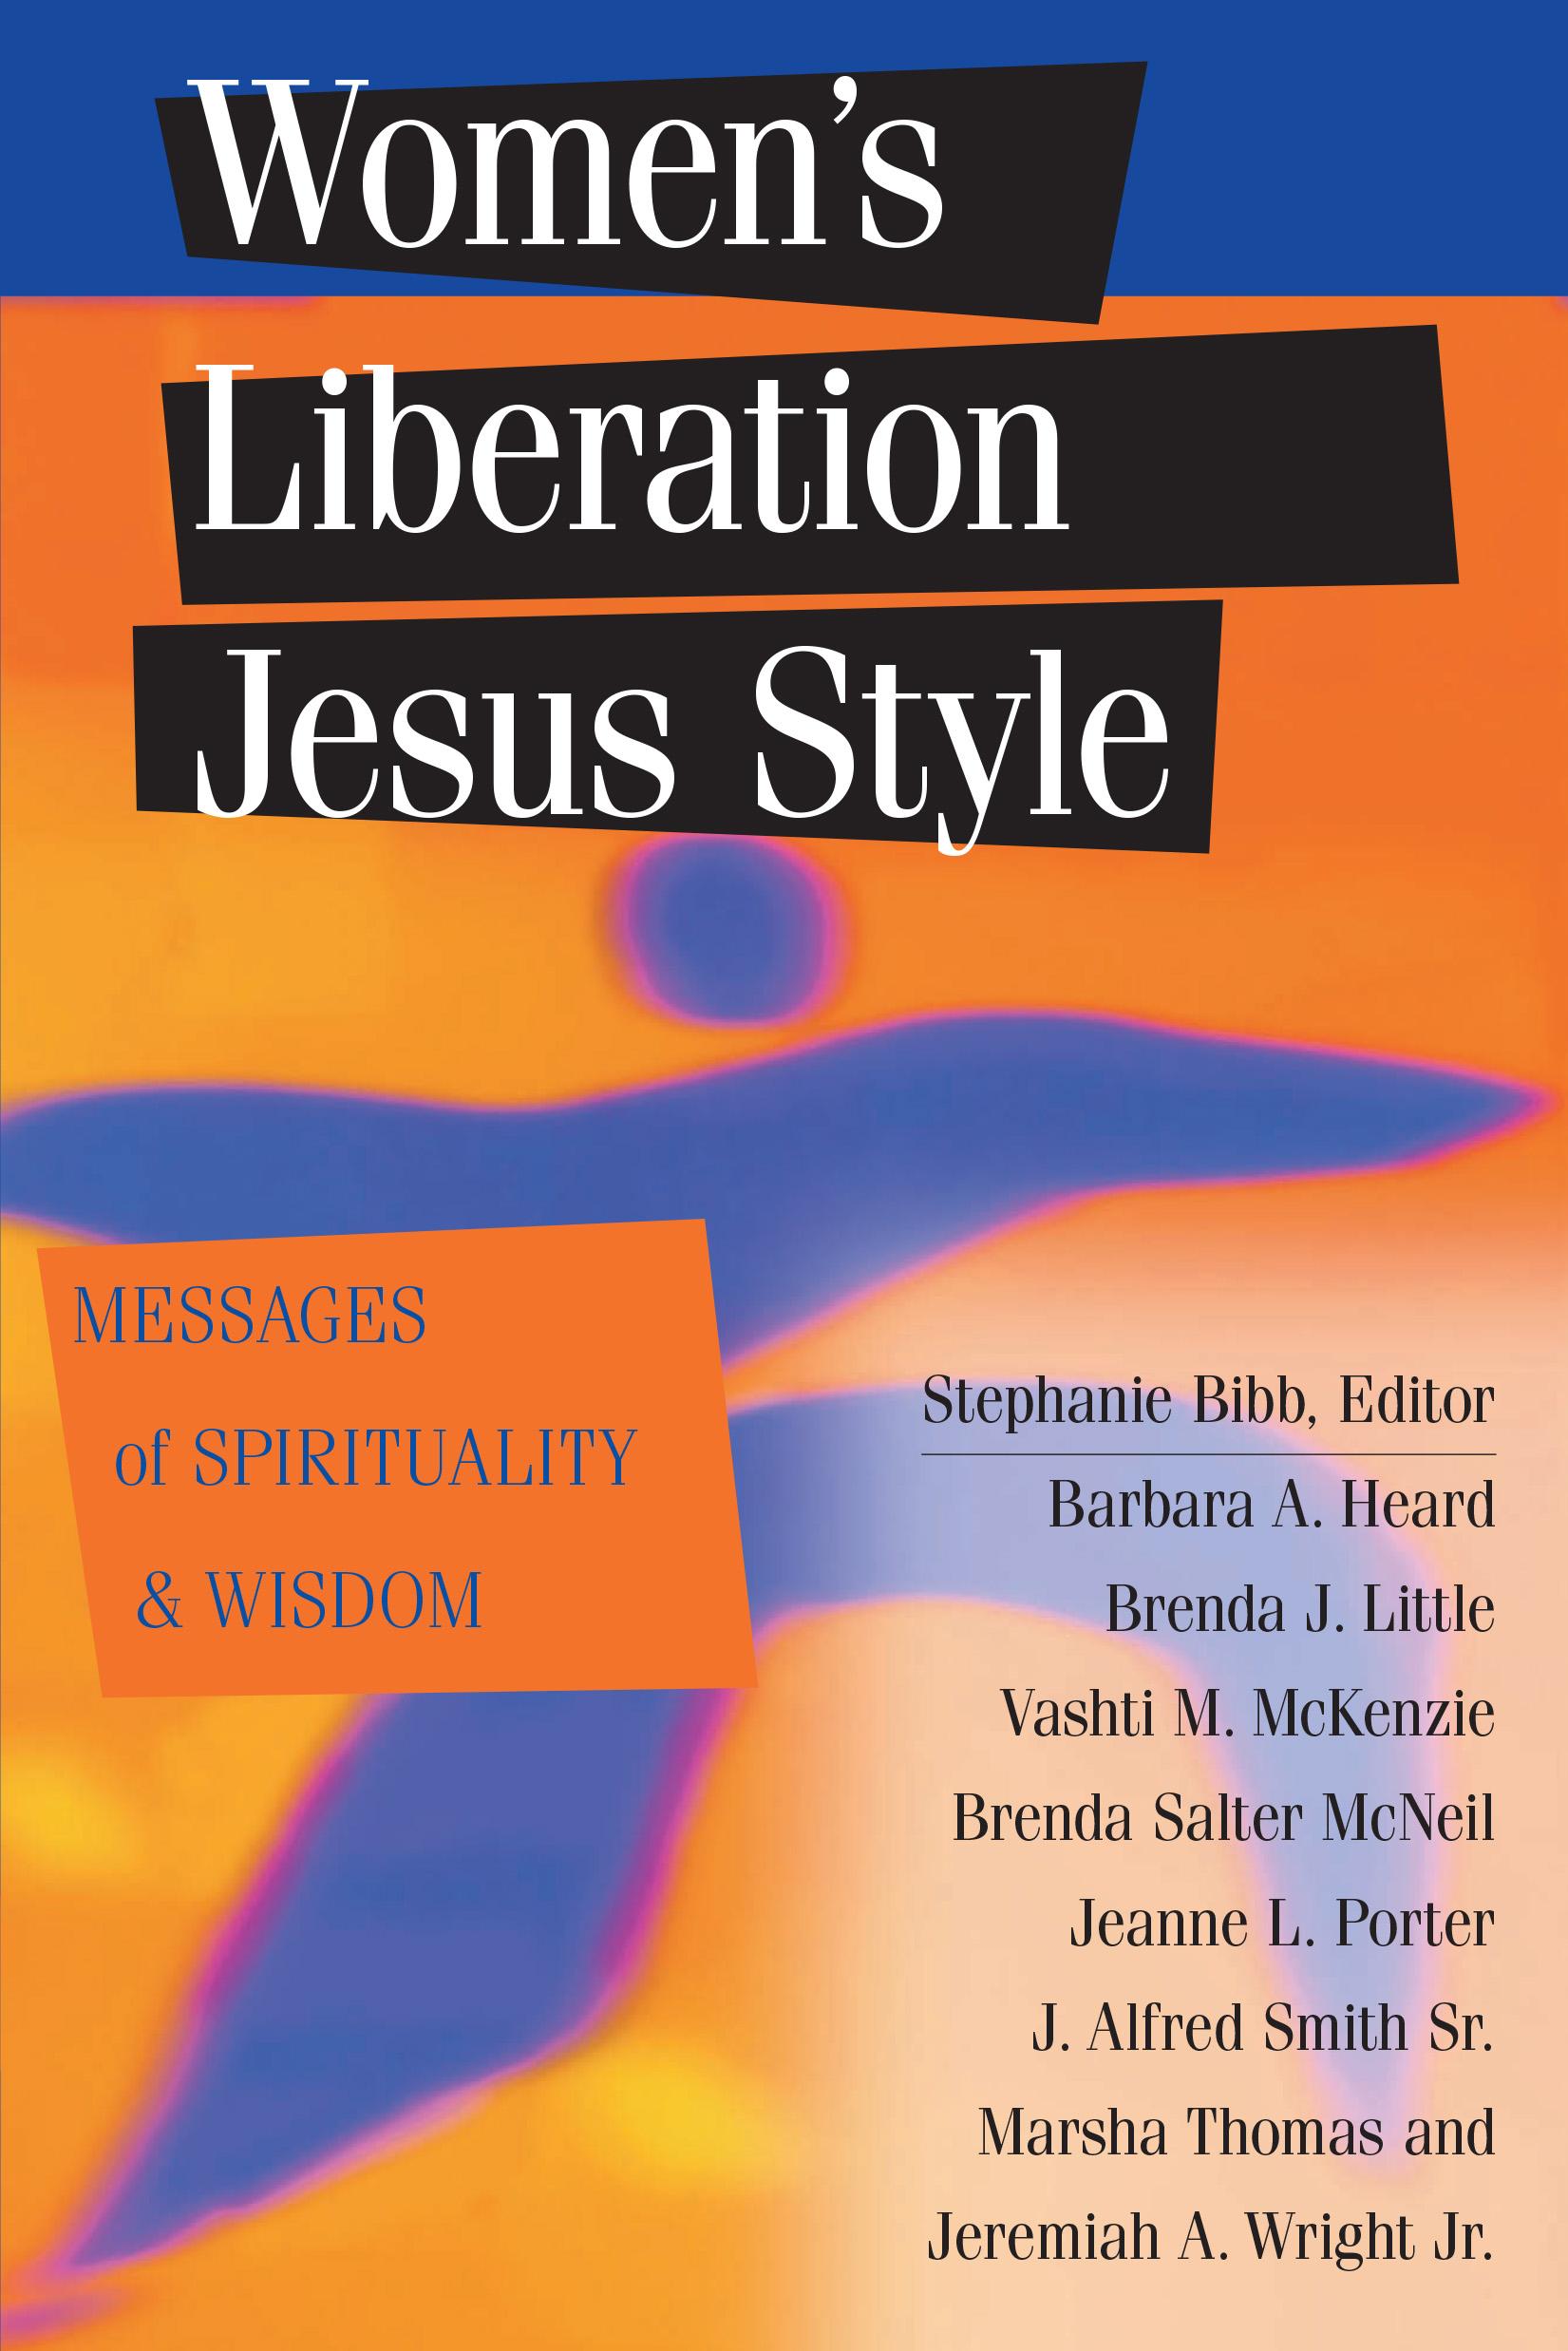 Women's Liberation Jesus Style